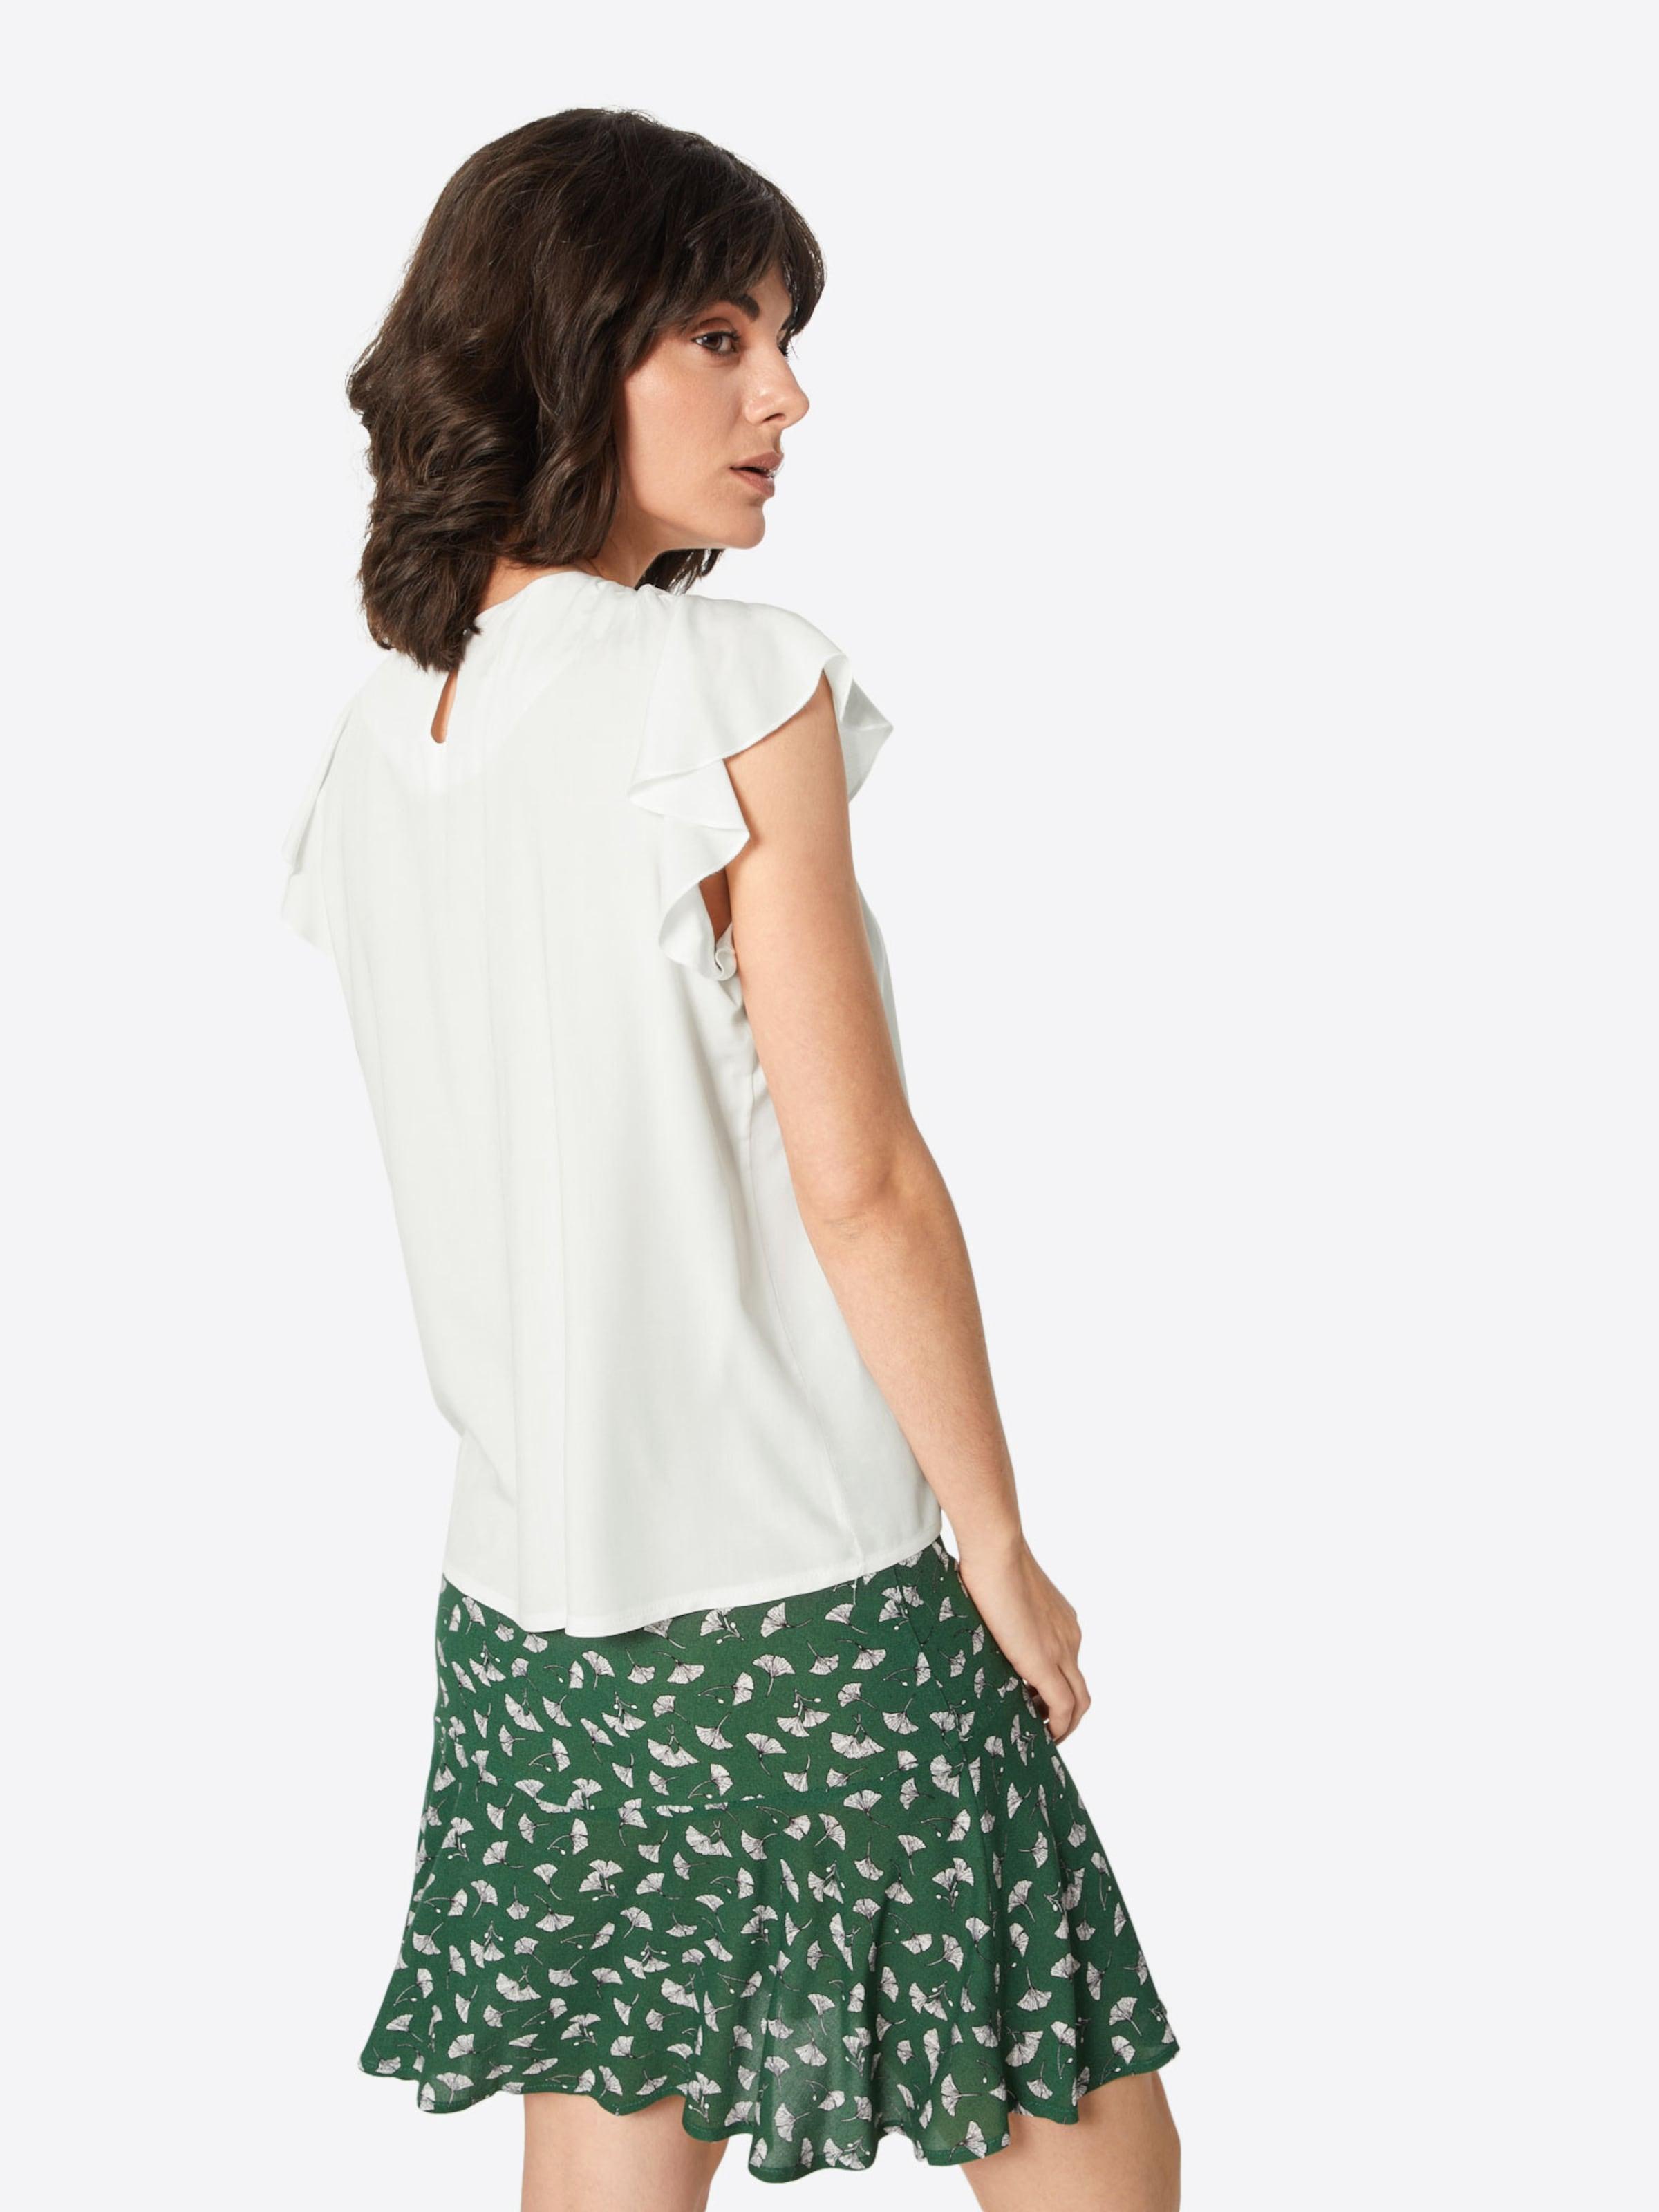 Broadway Fashion Nyc Weiß In 'delfina' Shirt UpSVzM